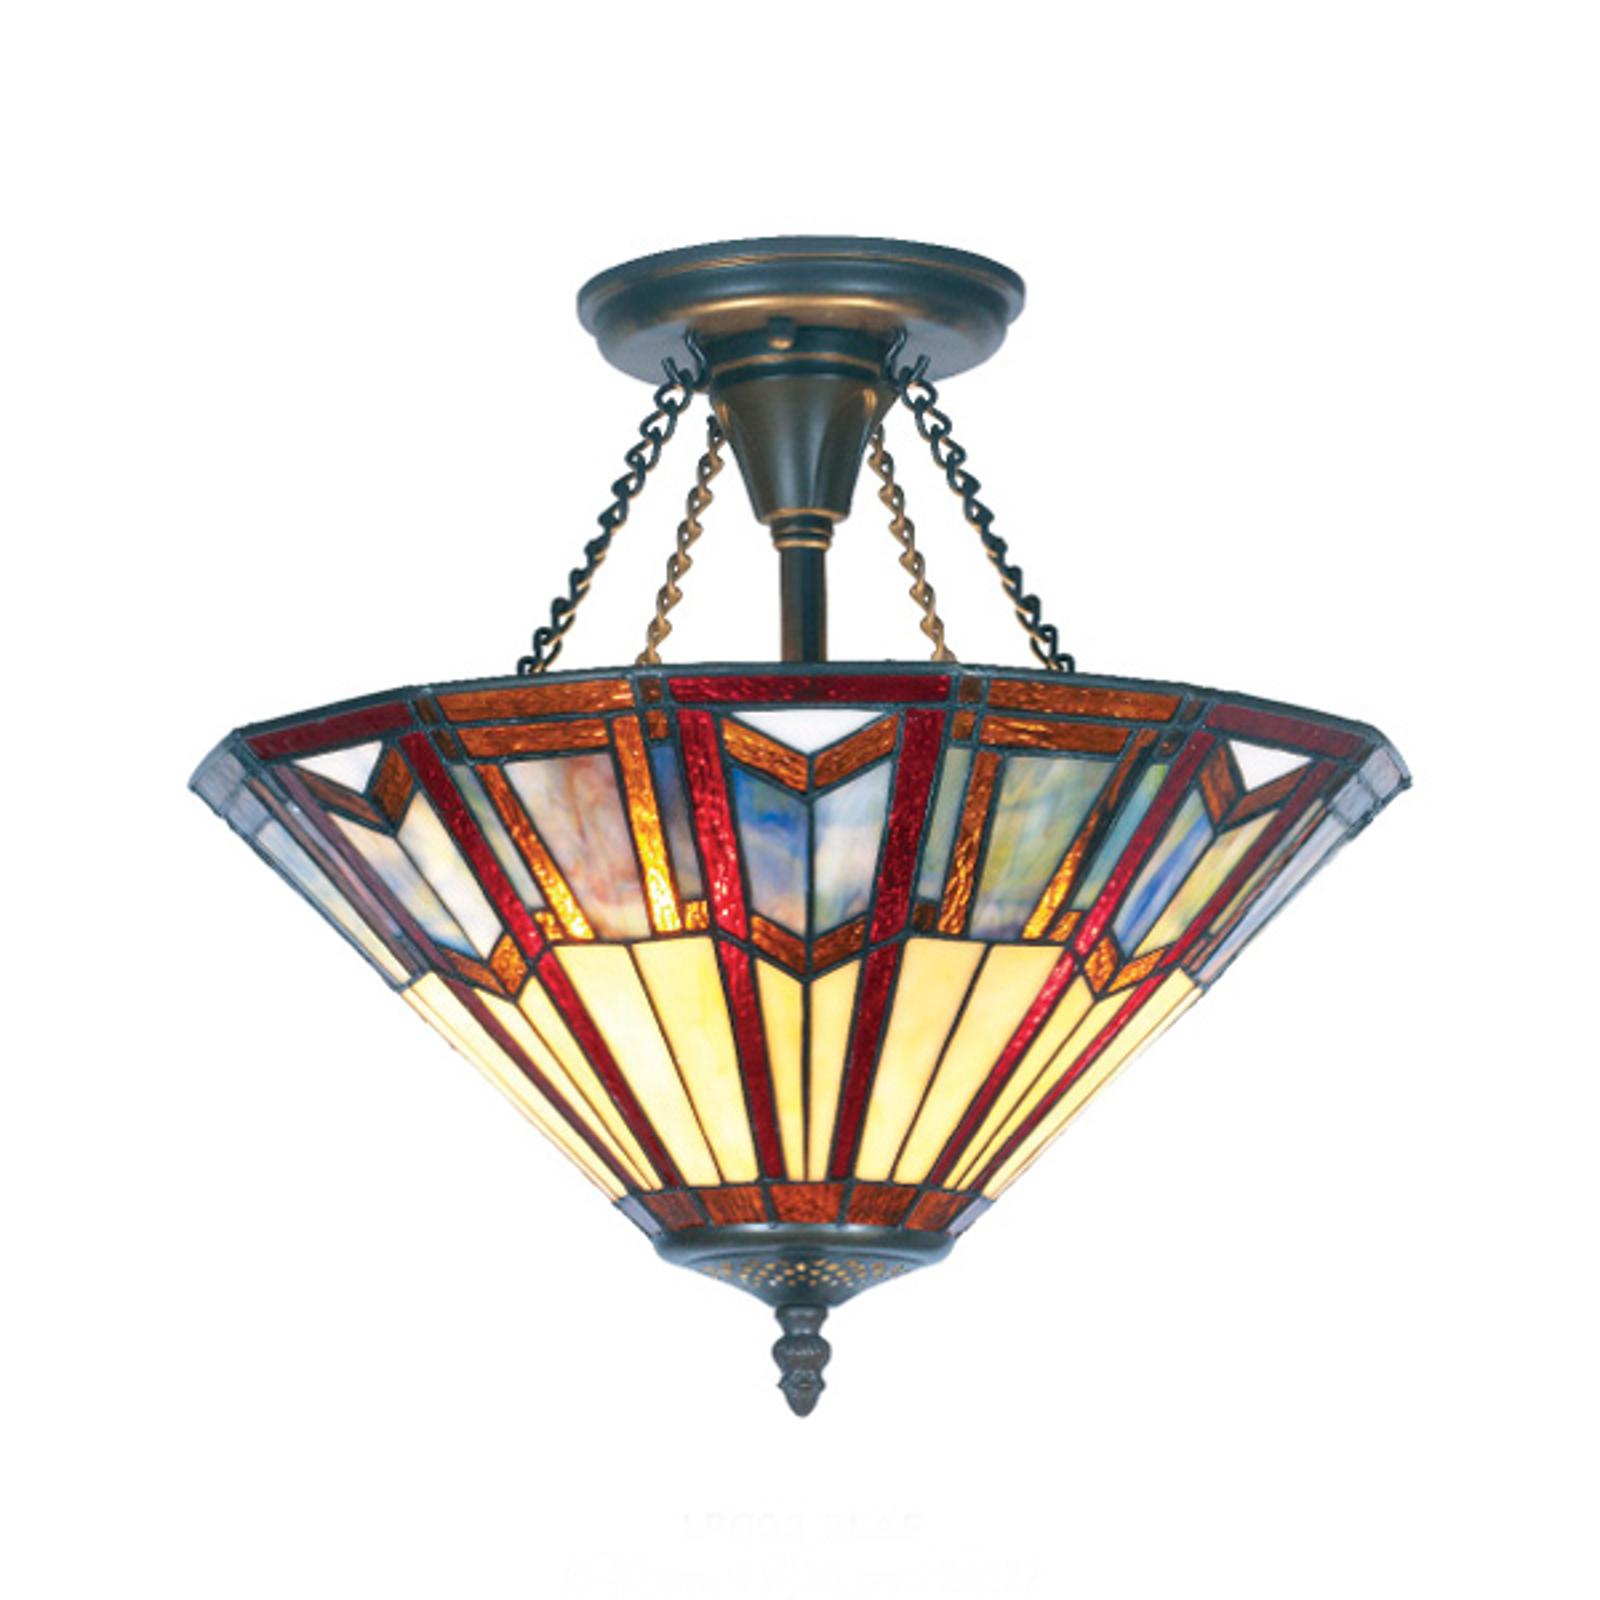 LILLIE - loftslampe i Tiffany stil